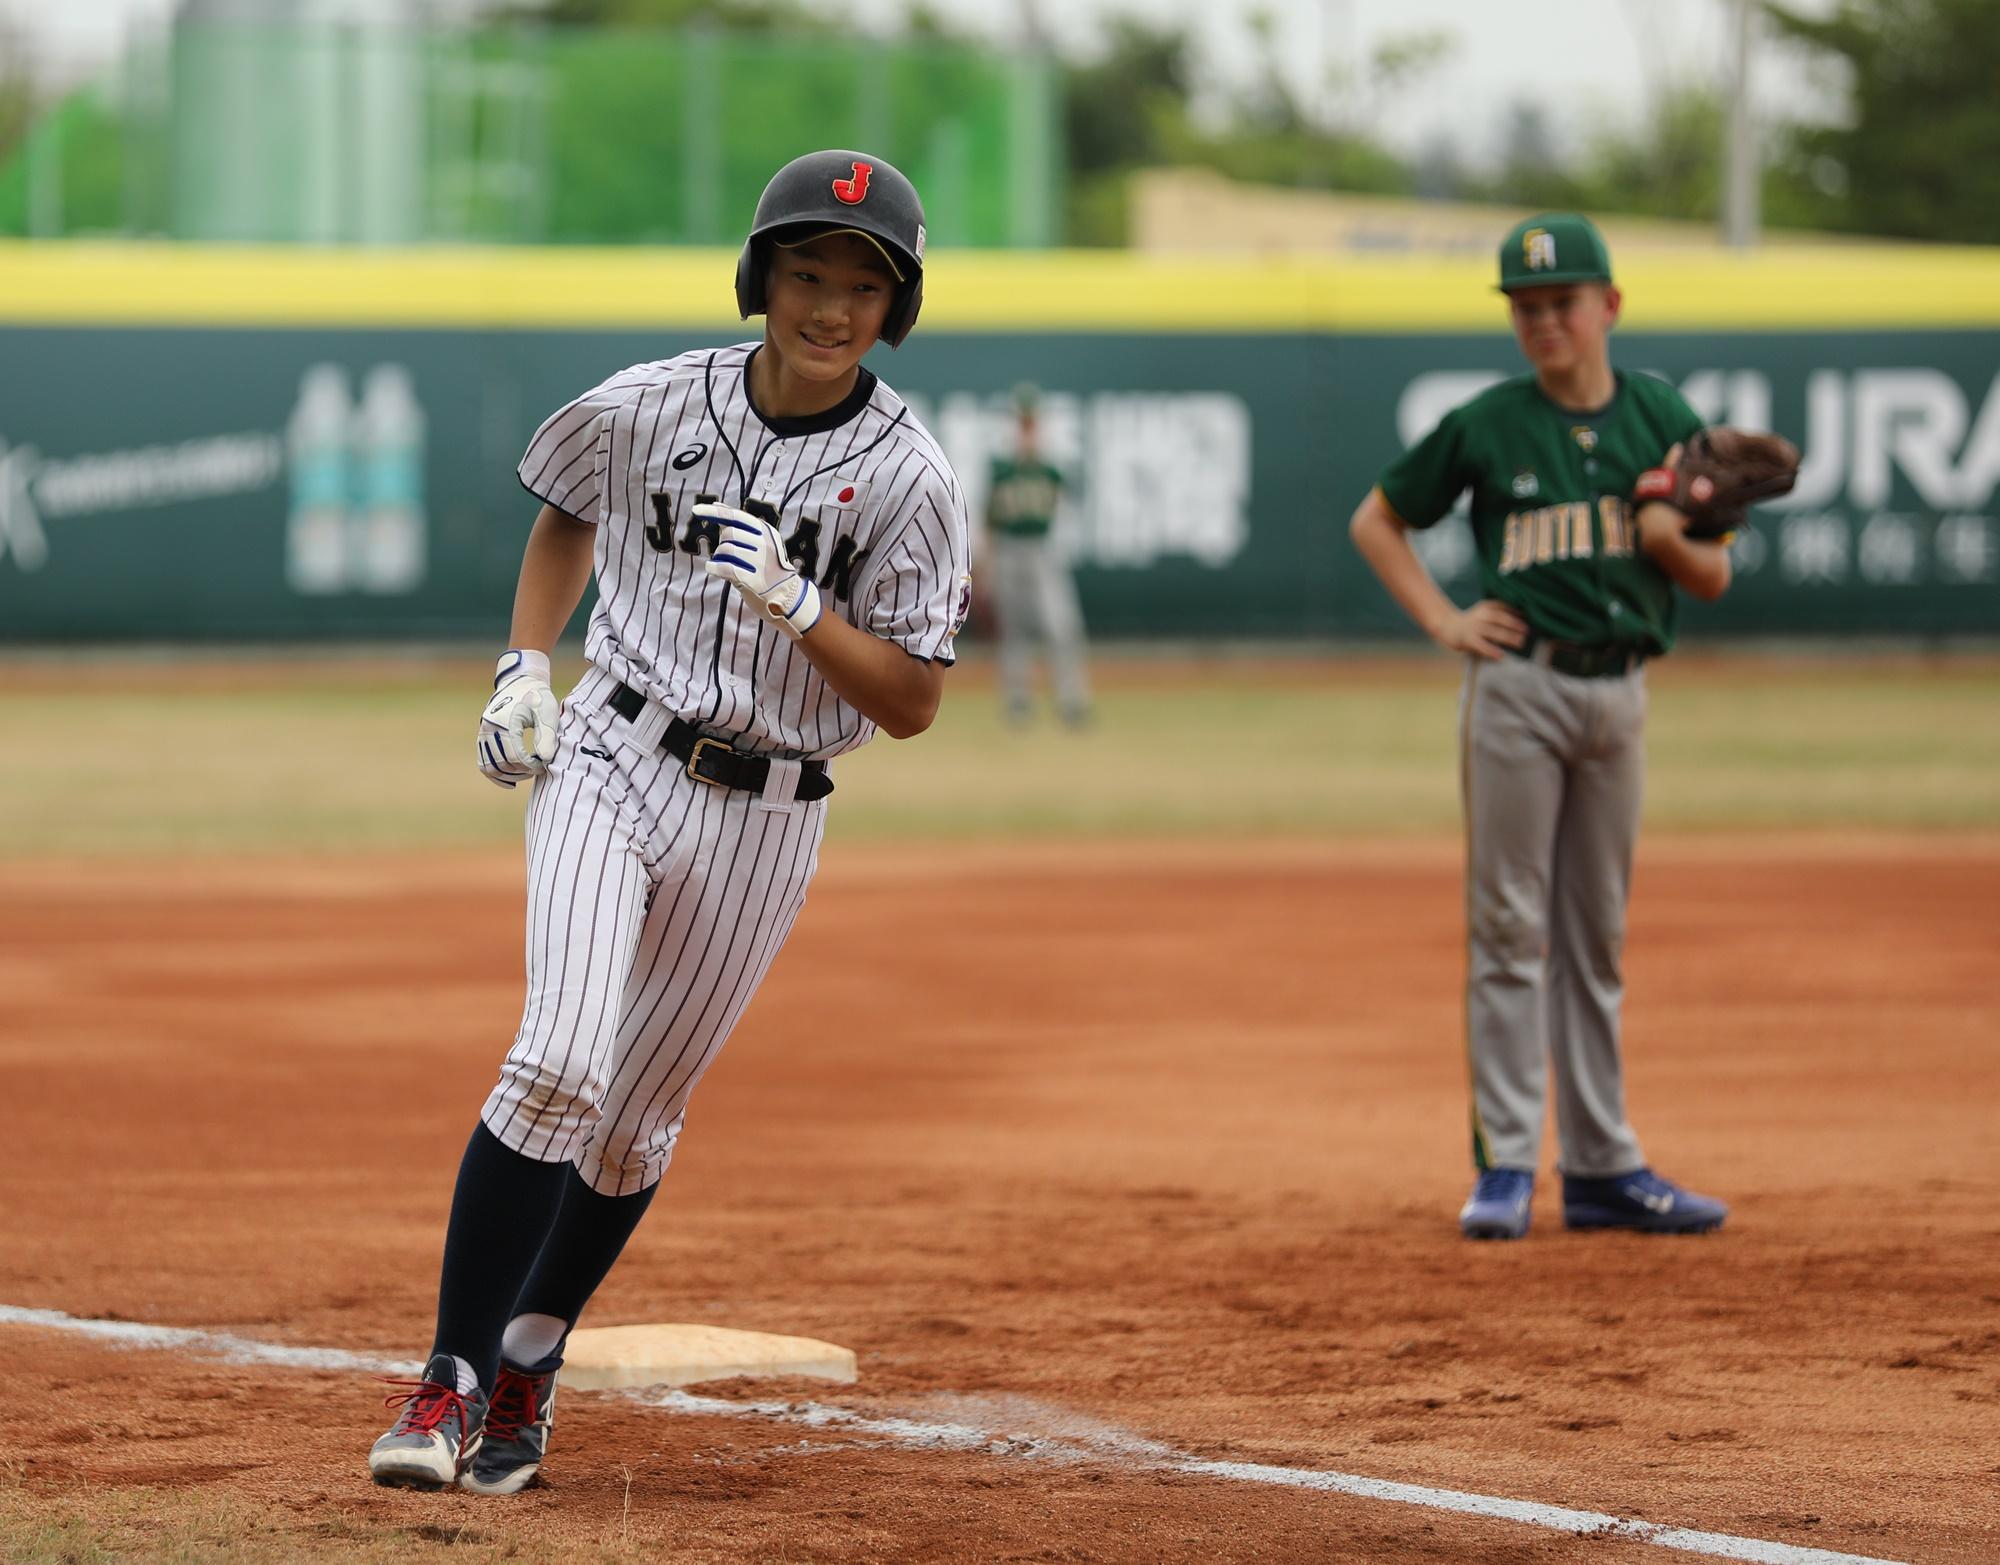 Kyonosuke Hayashi hit a home run